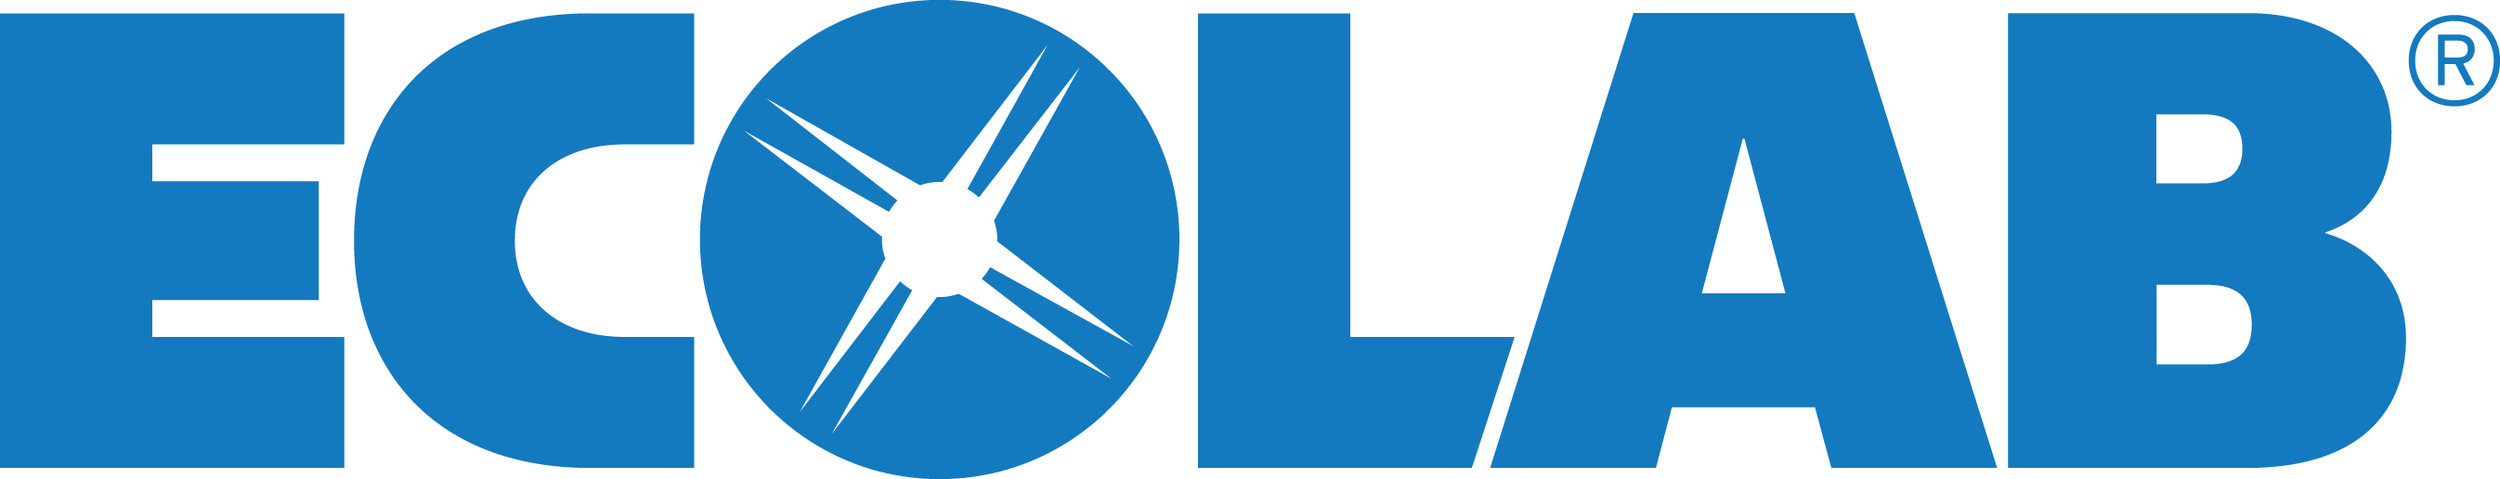 Ecolab logo RGB_0-122-201.jpg